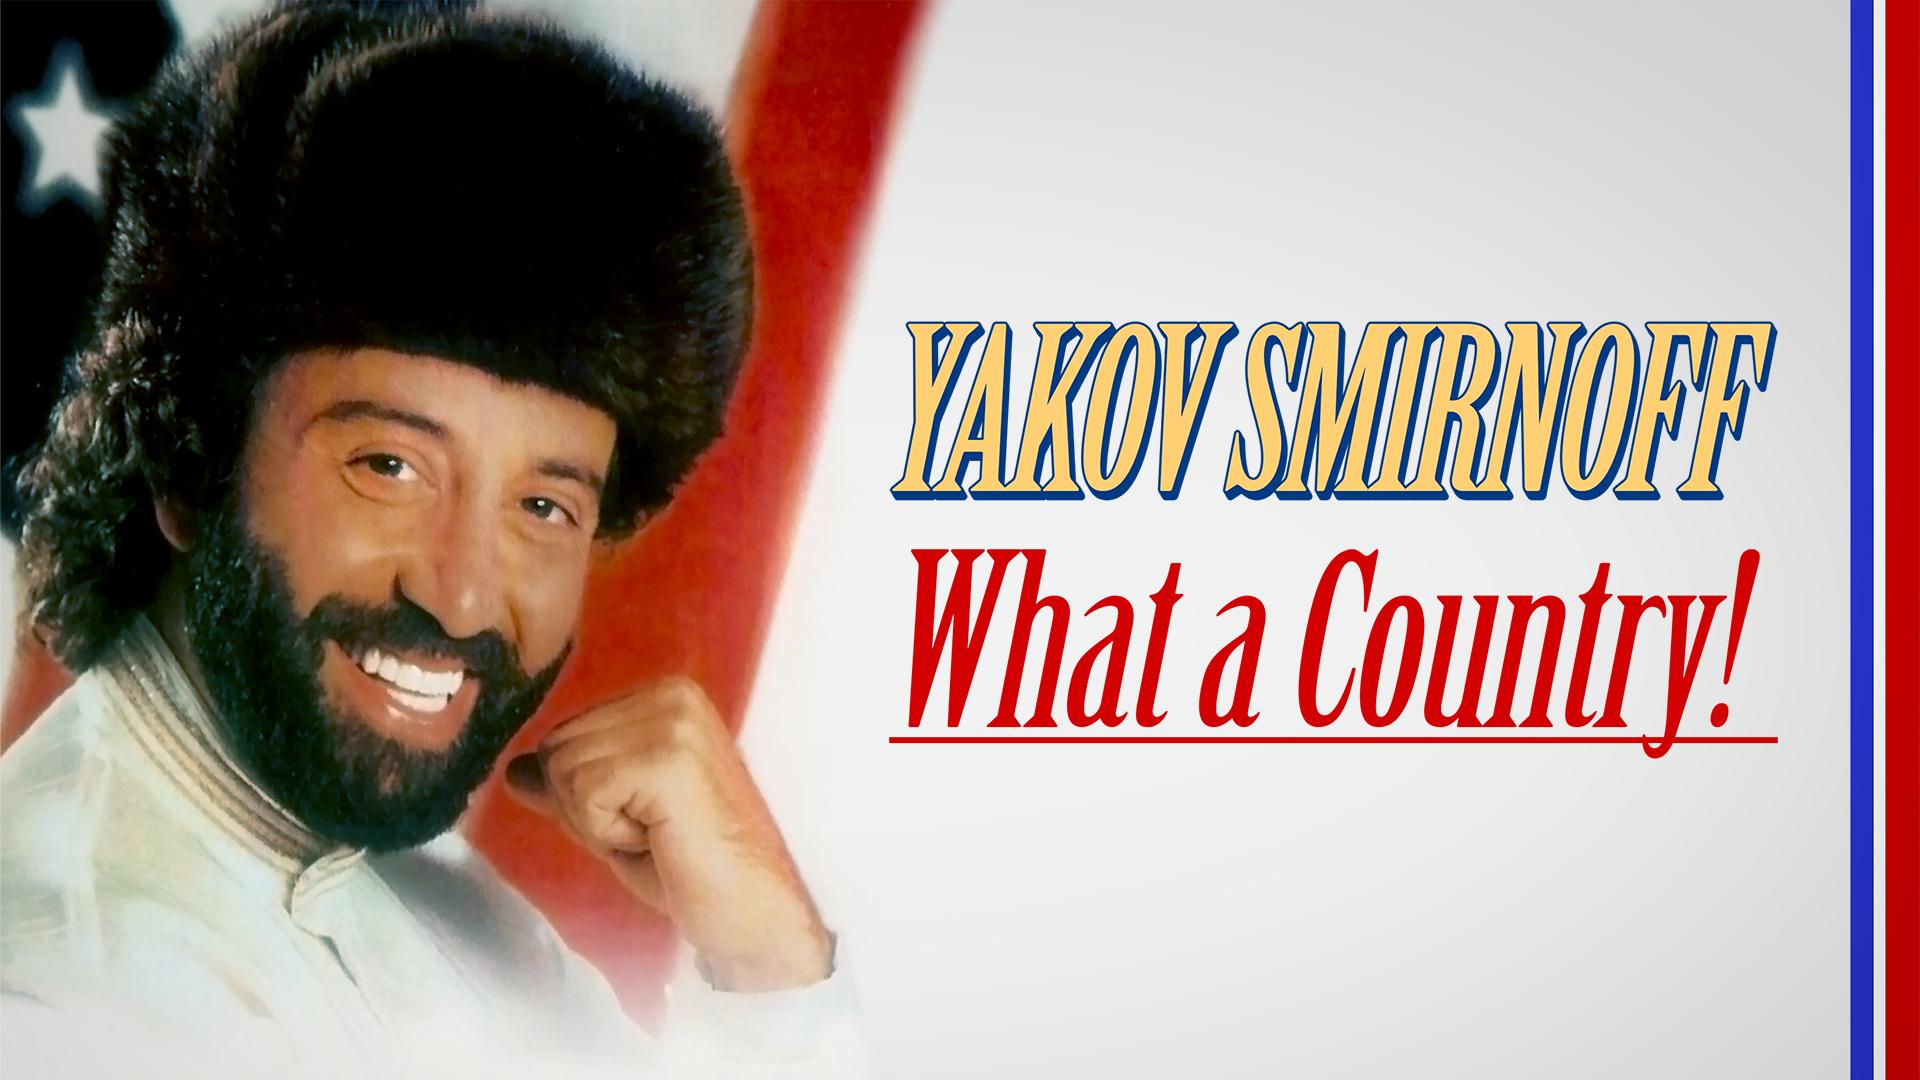 Yakov Smirnoff: What A Country!